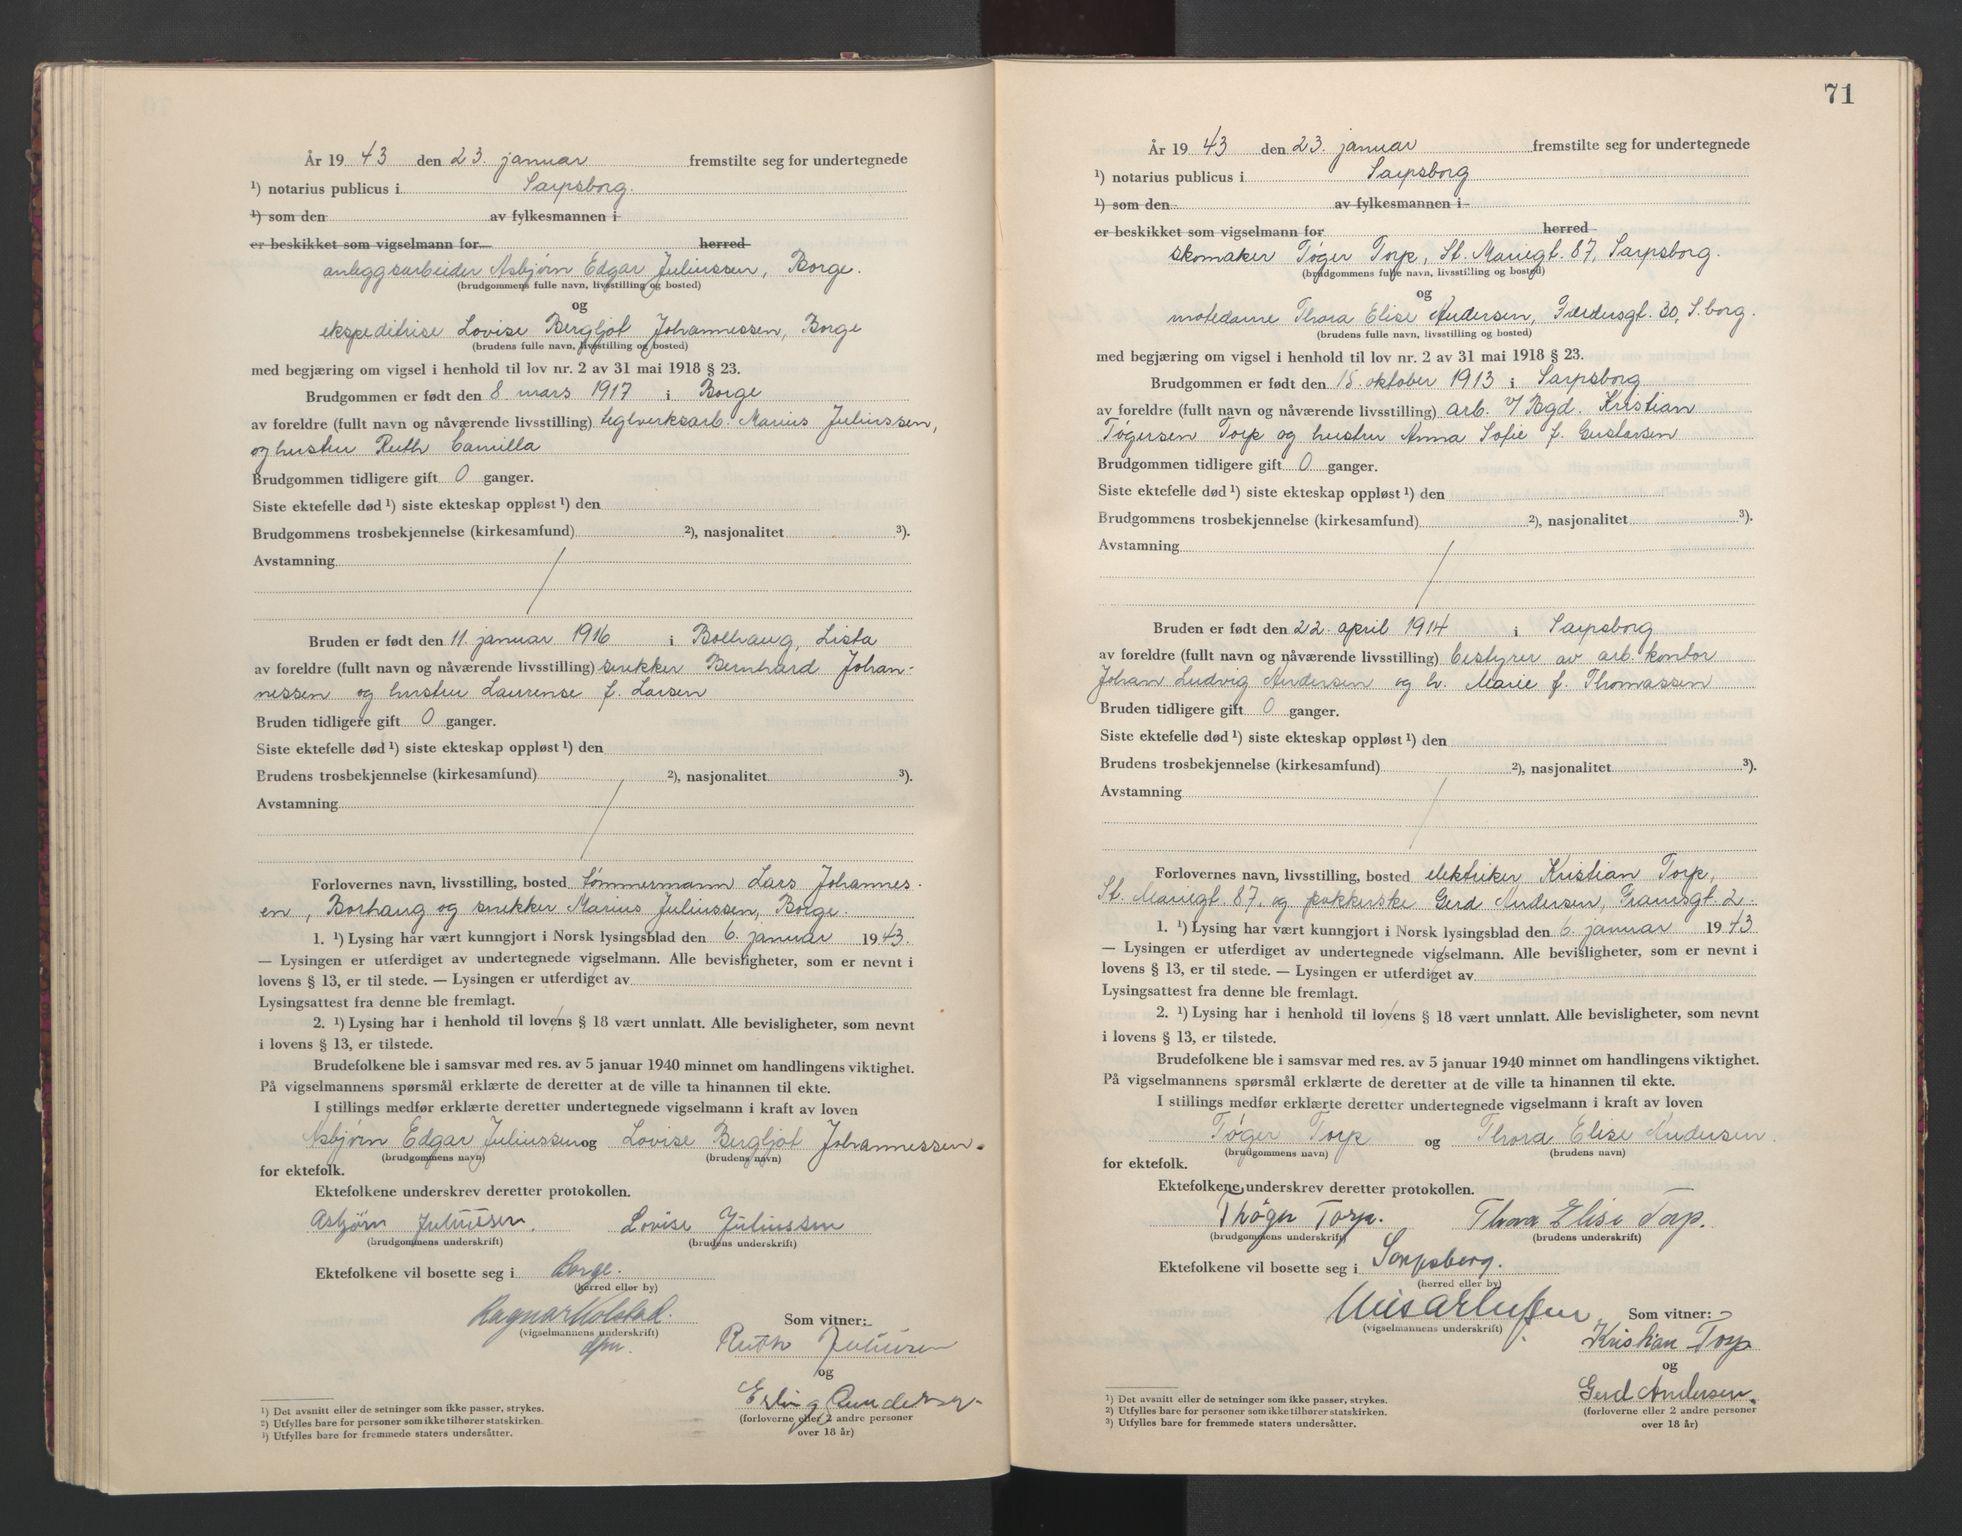 SAO, Sarpsborg byfogd, L/Lb/Lba/L0002: Vigselbok, 1942-1943, s. 71